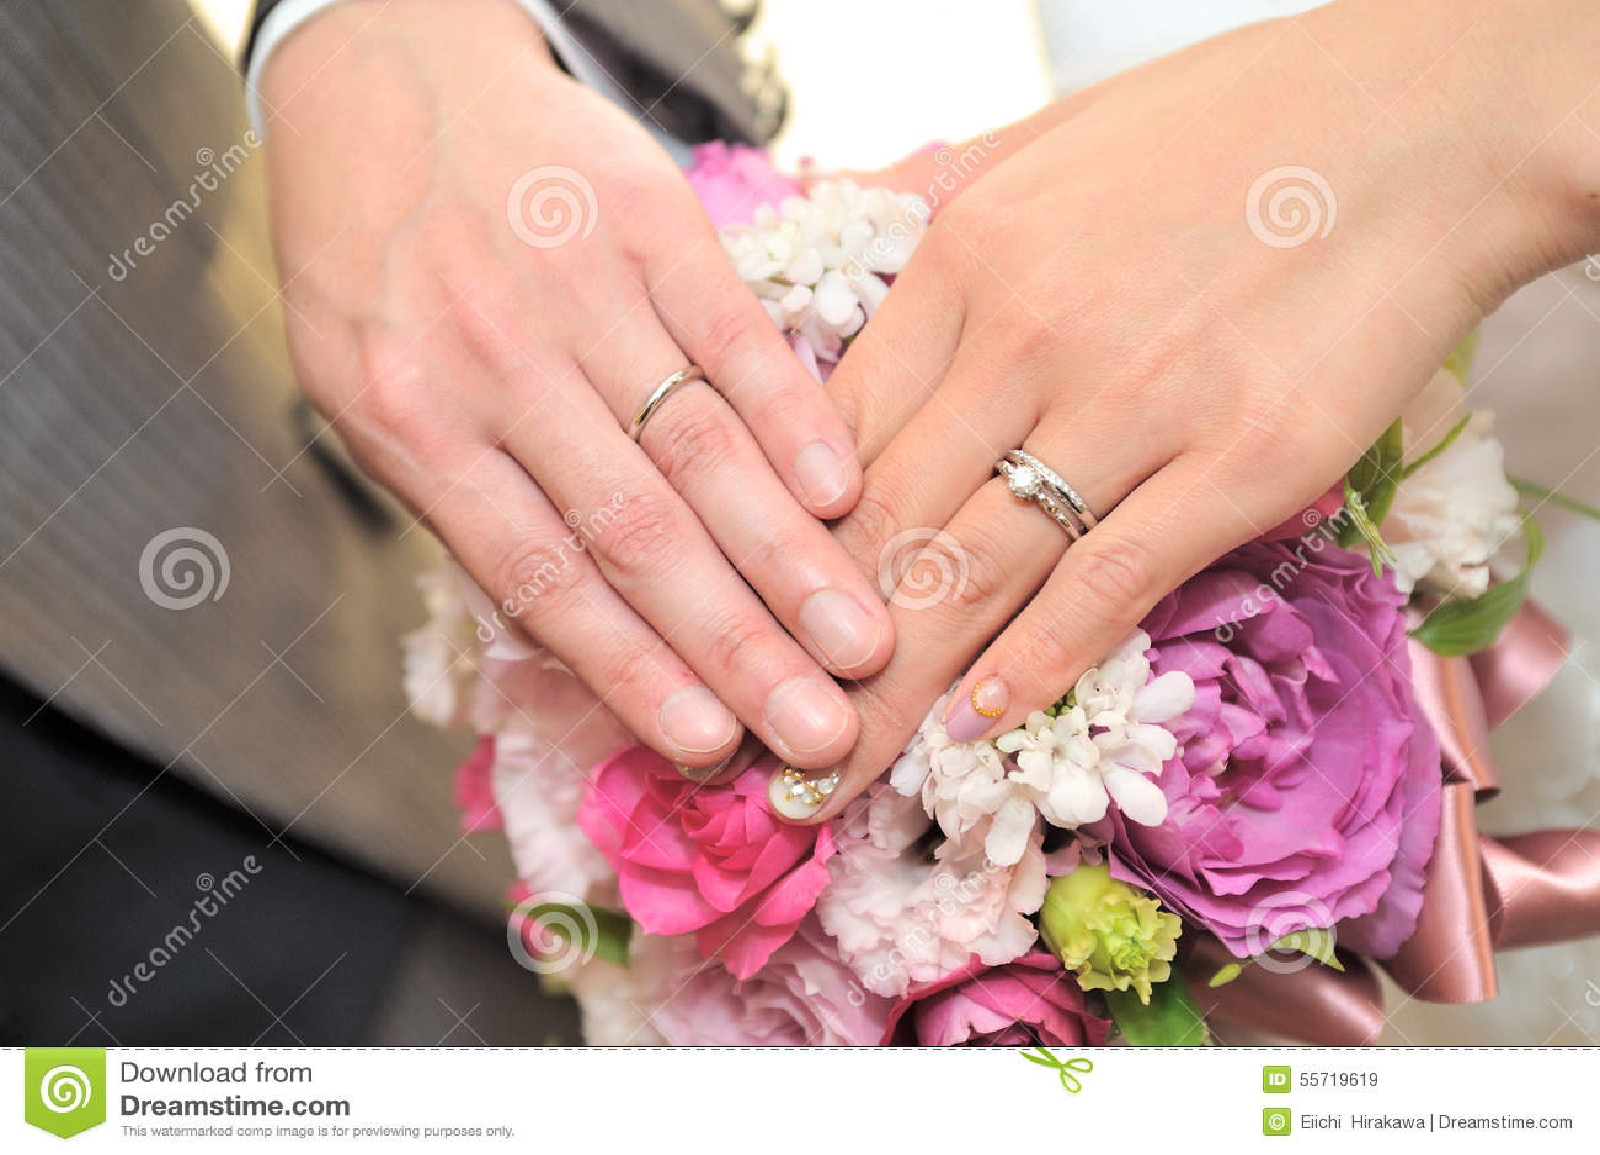 Wedding ring stock image. Image of arranged, bouquet - 55719619